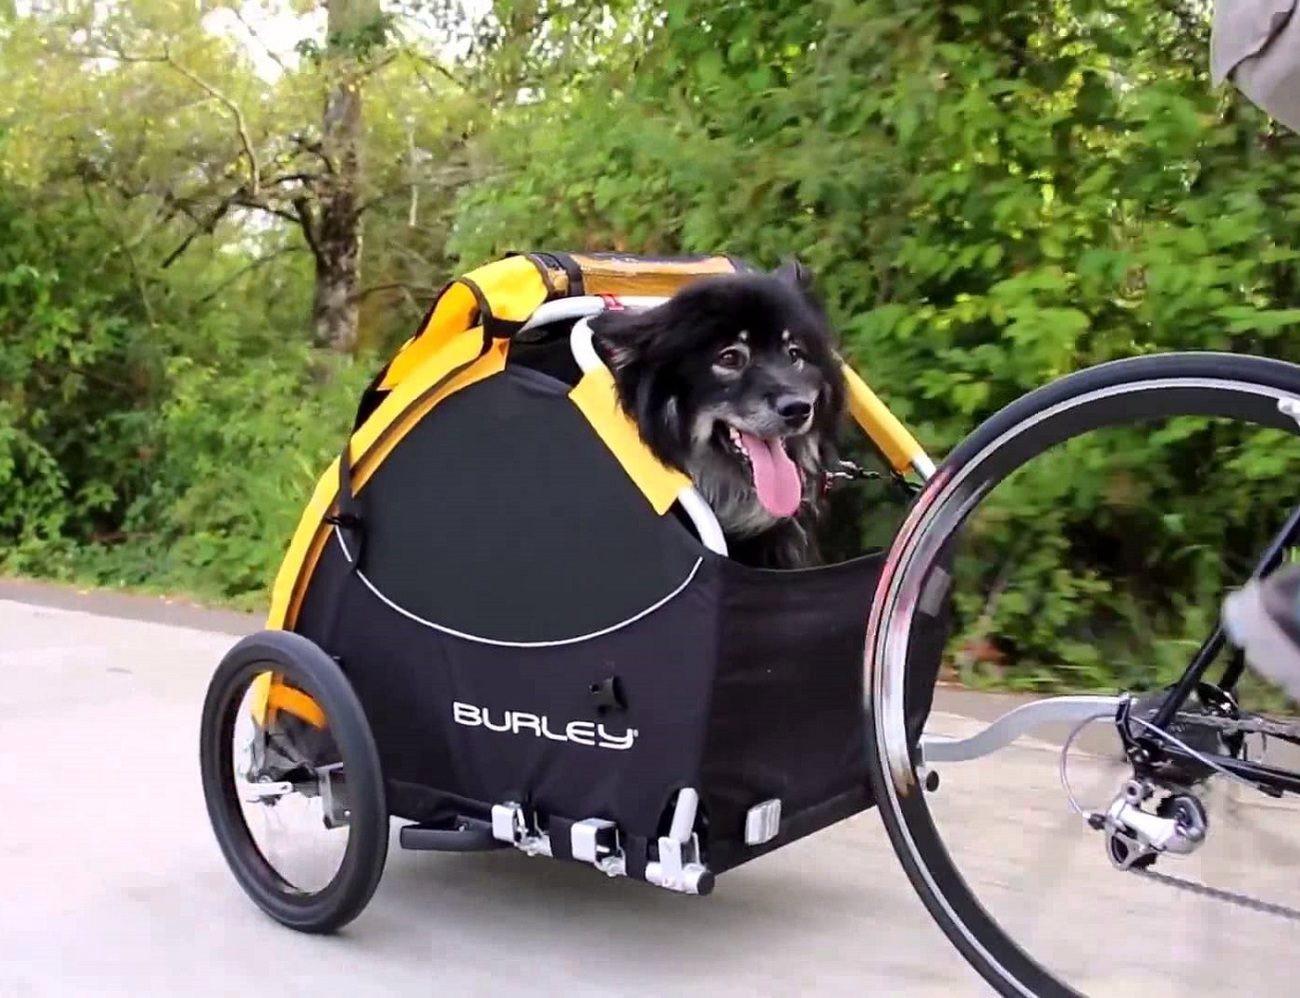 Pet bicycle